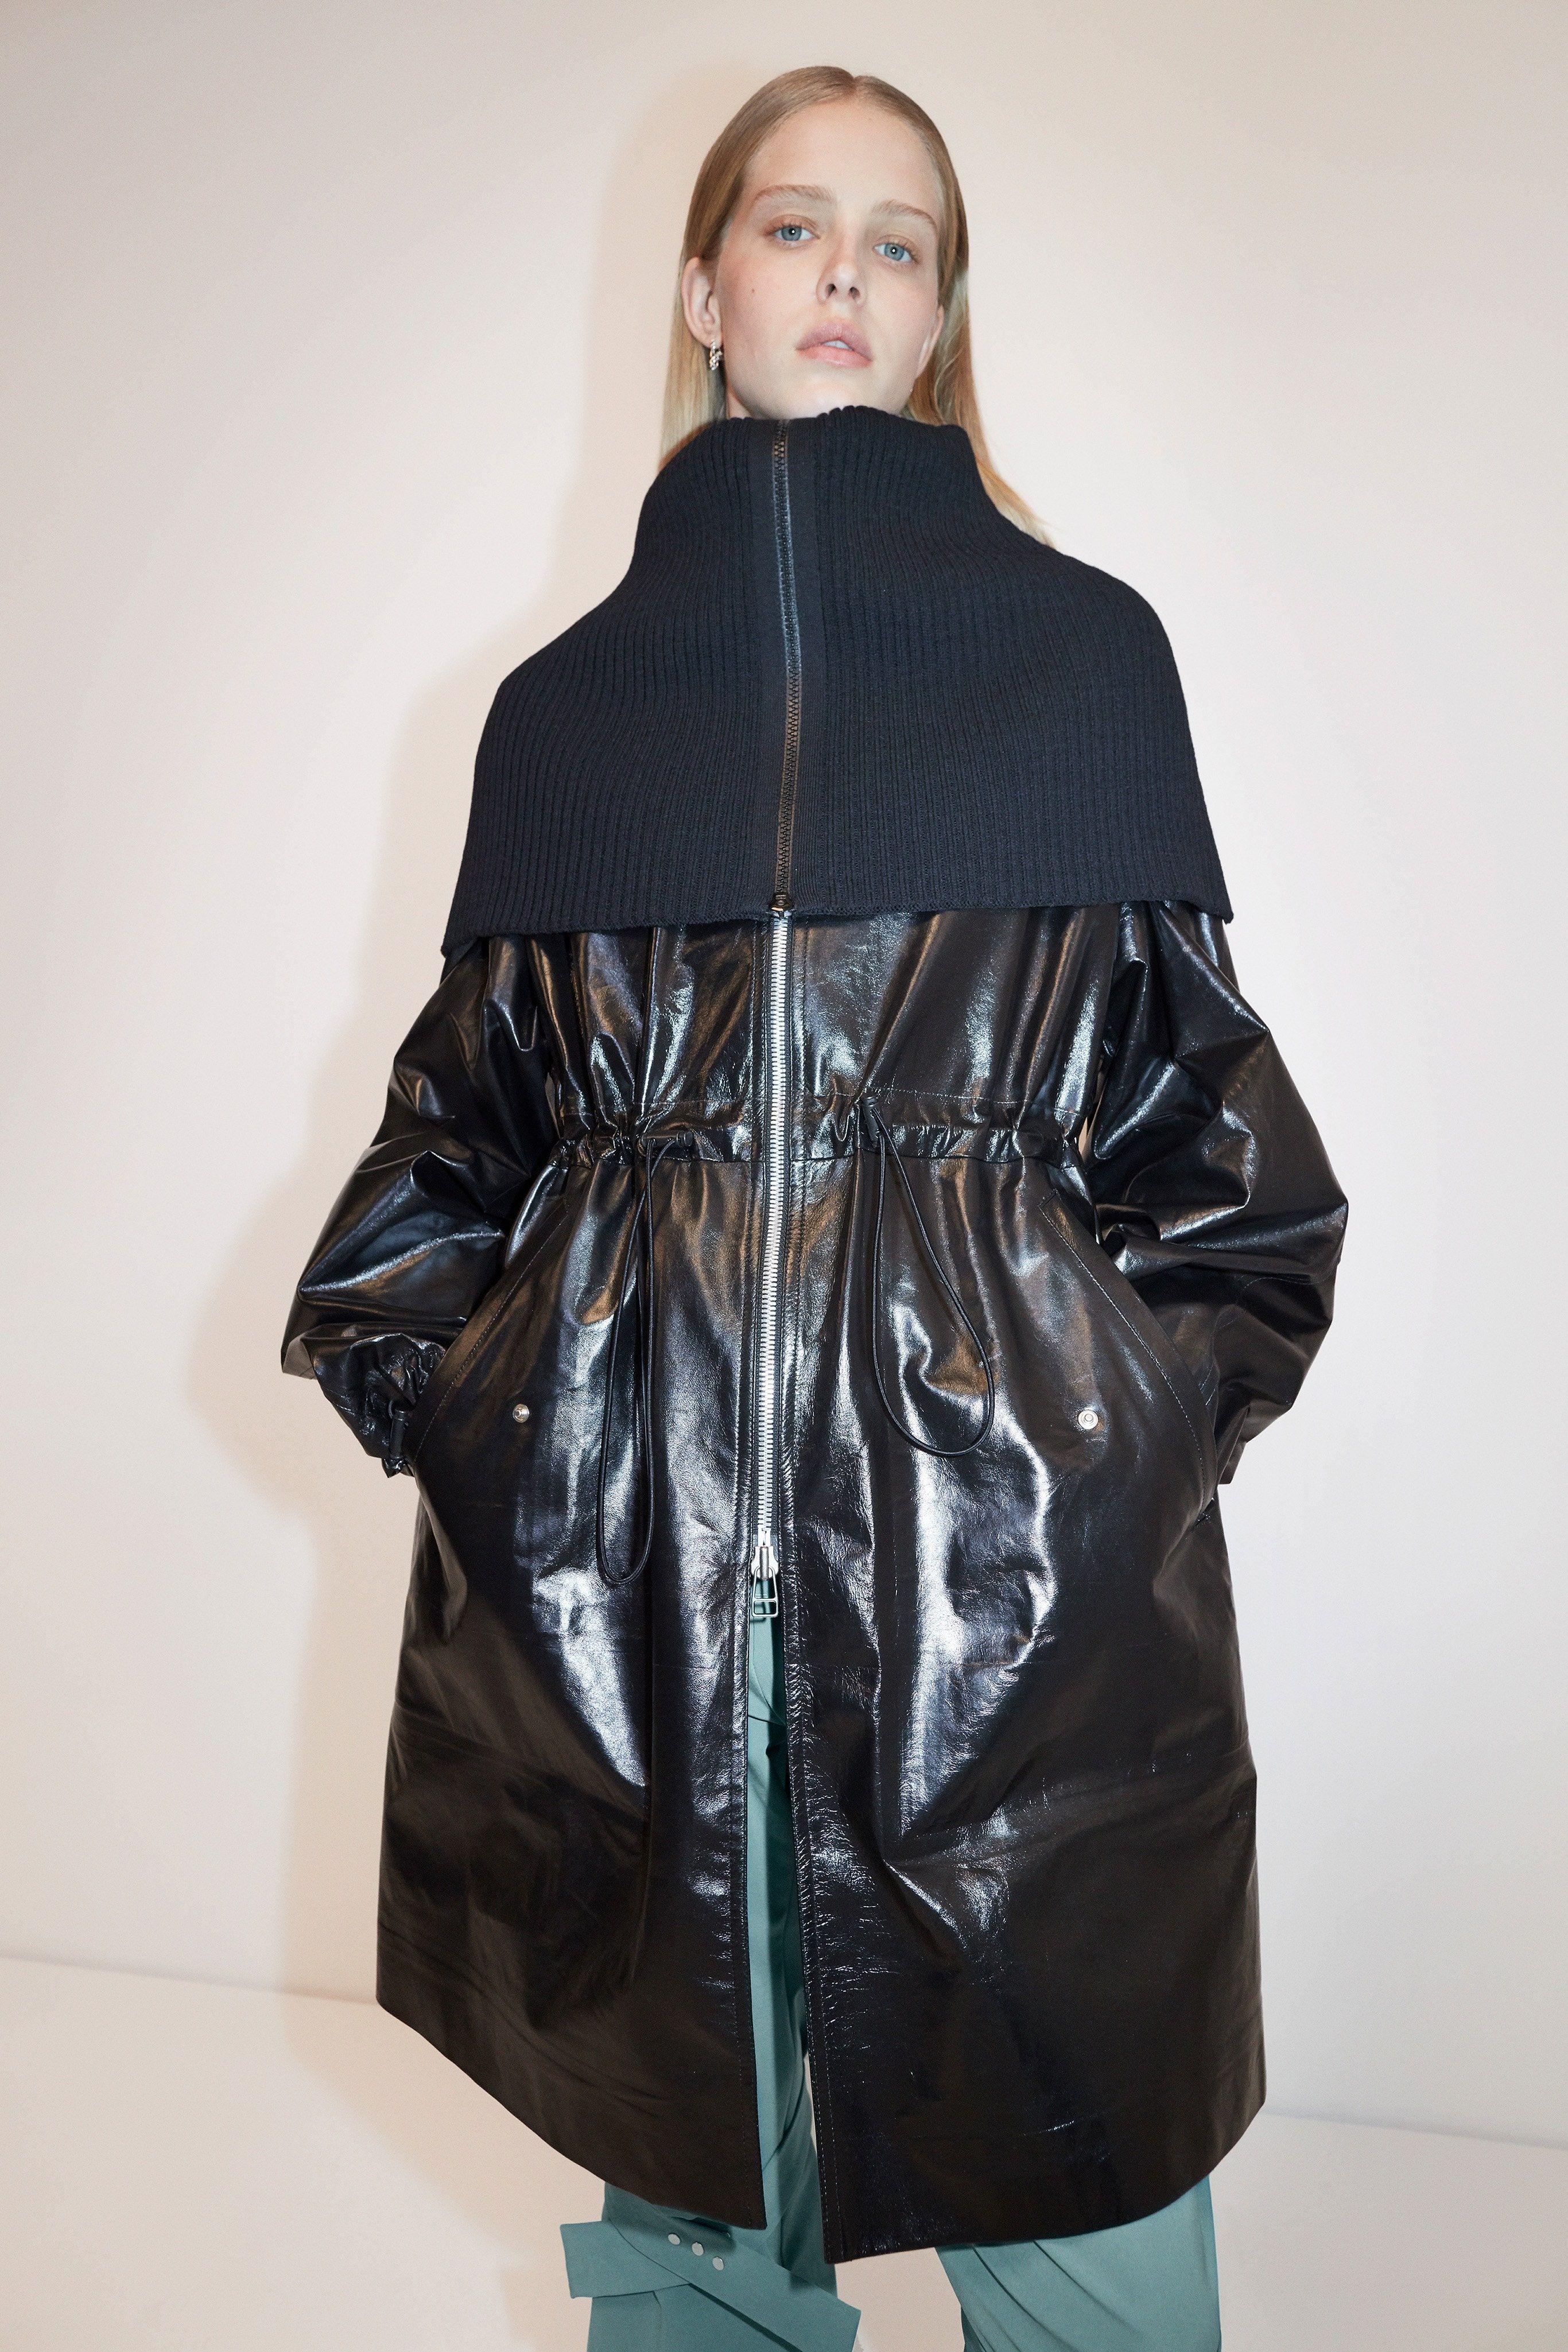 Bottega Veneta Pre-Fall 2020 Fashion Show - Vogue